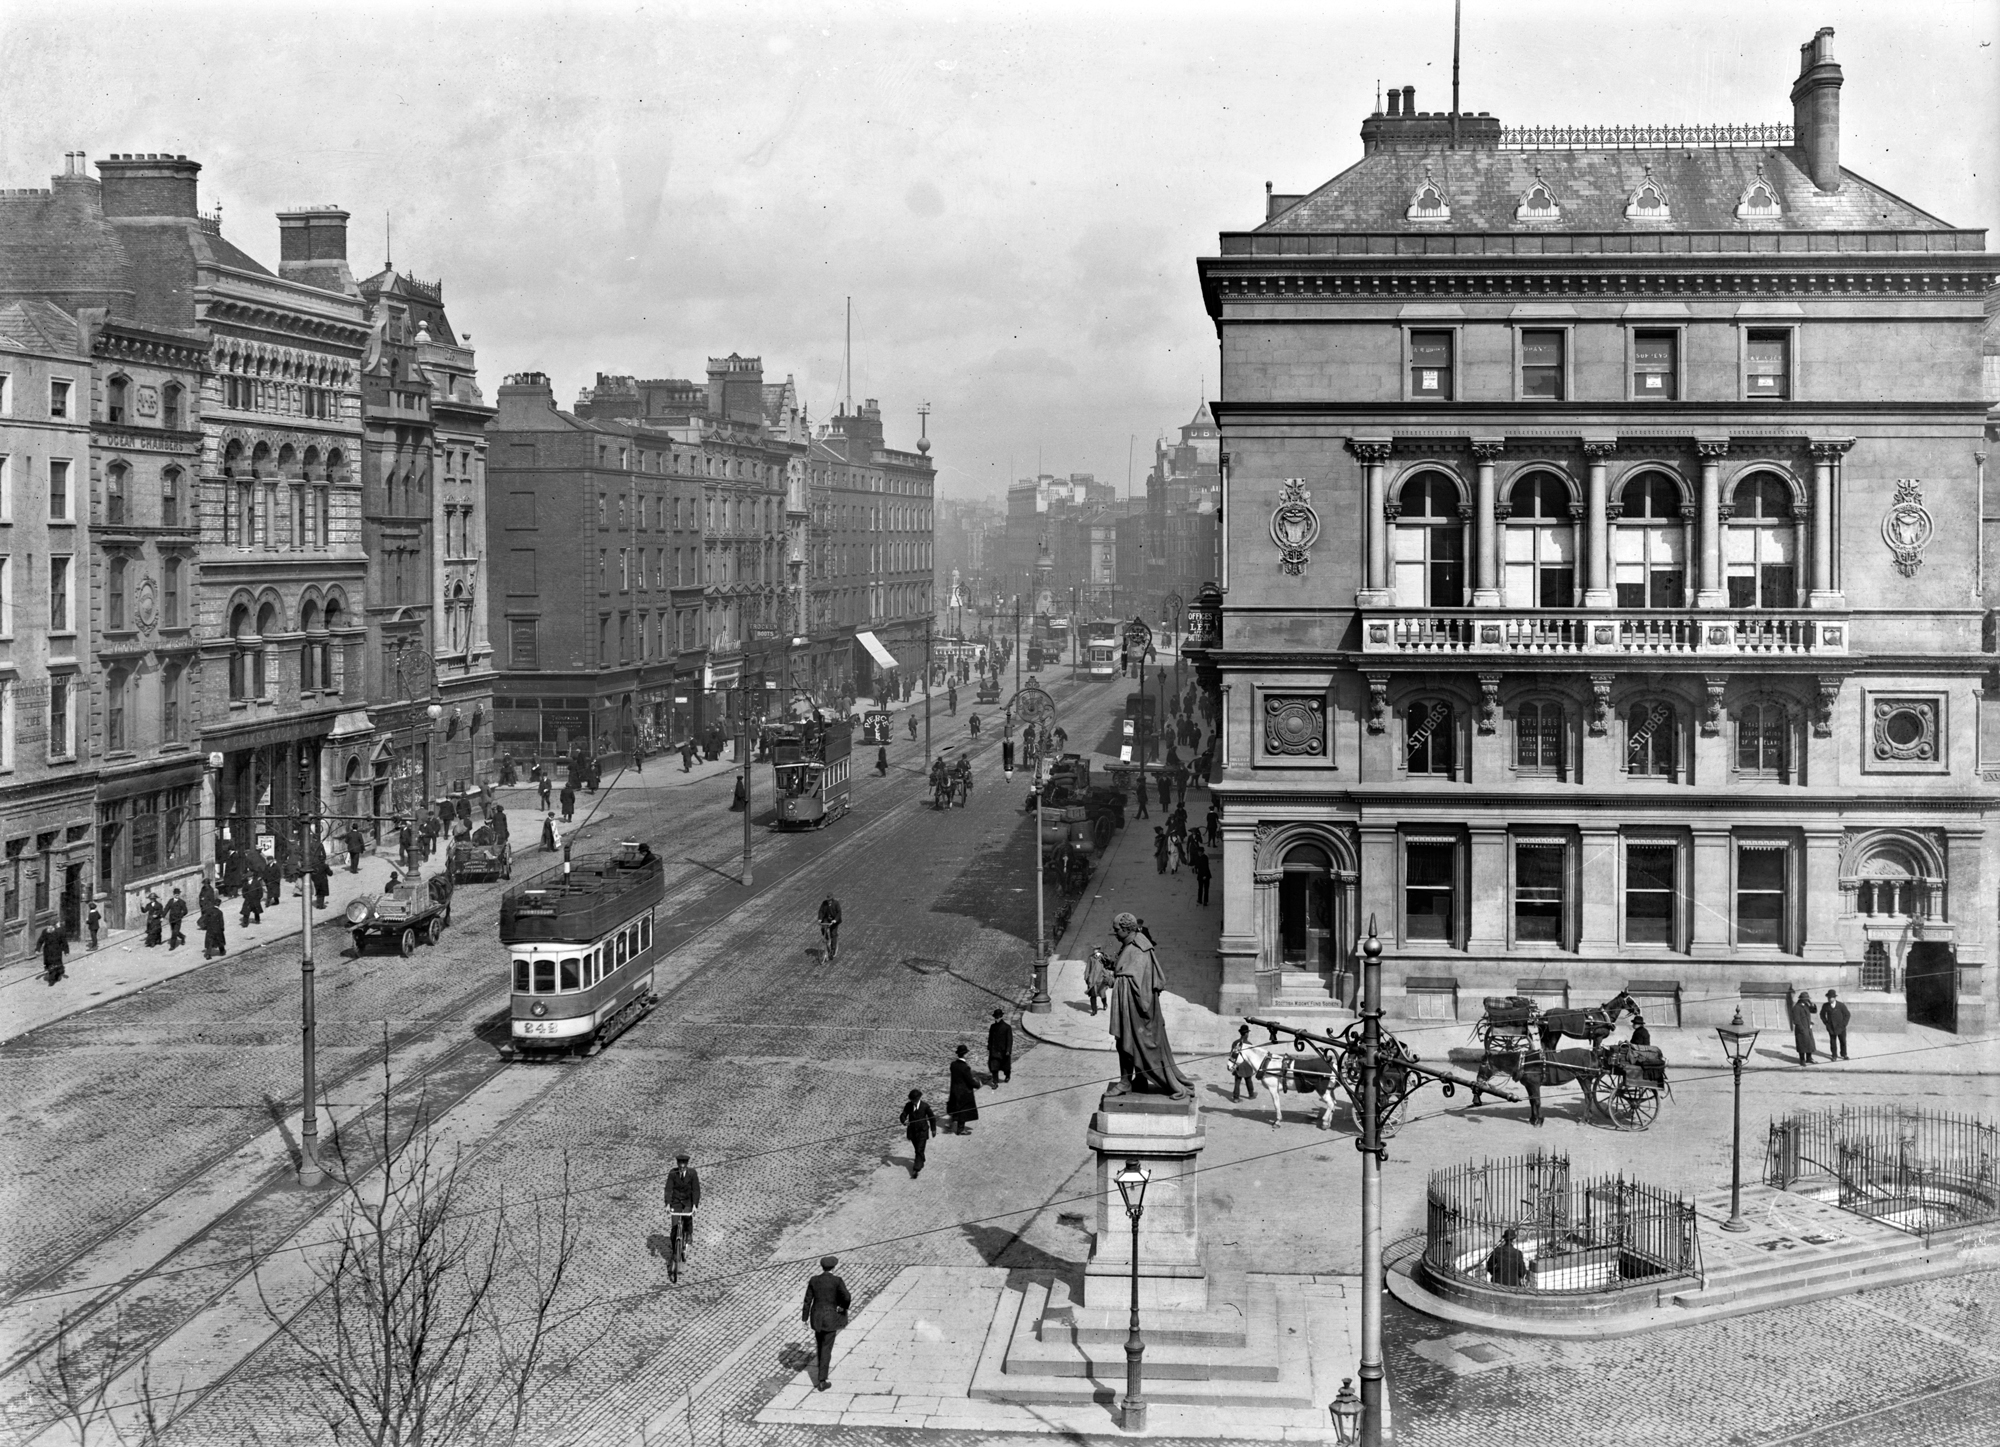 Westmoreland Street (looking to O'Connell Bridge, including a tram), Dublin City, Co. Dublin